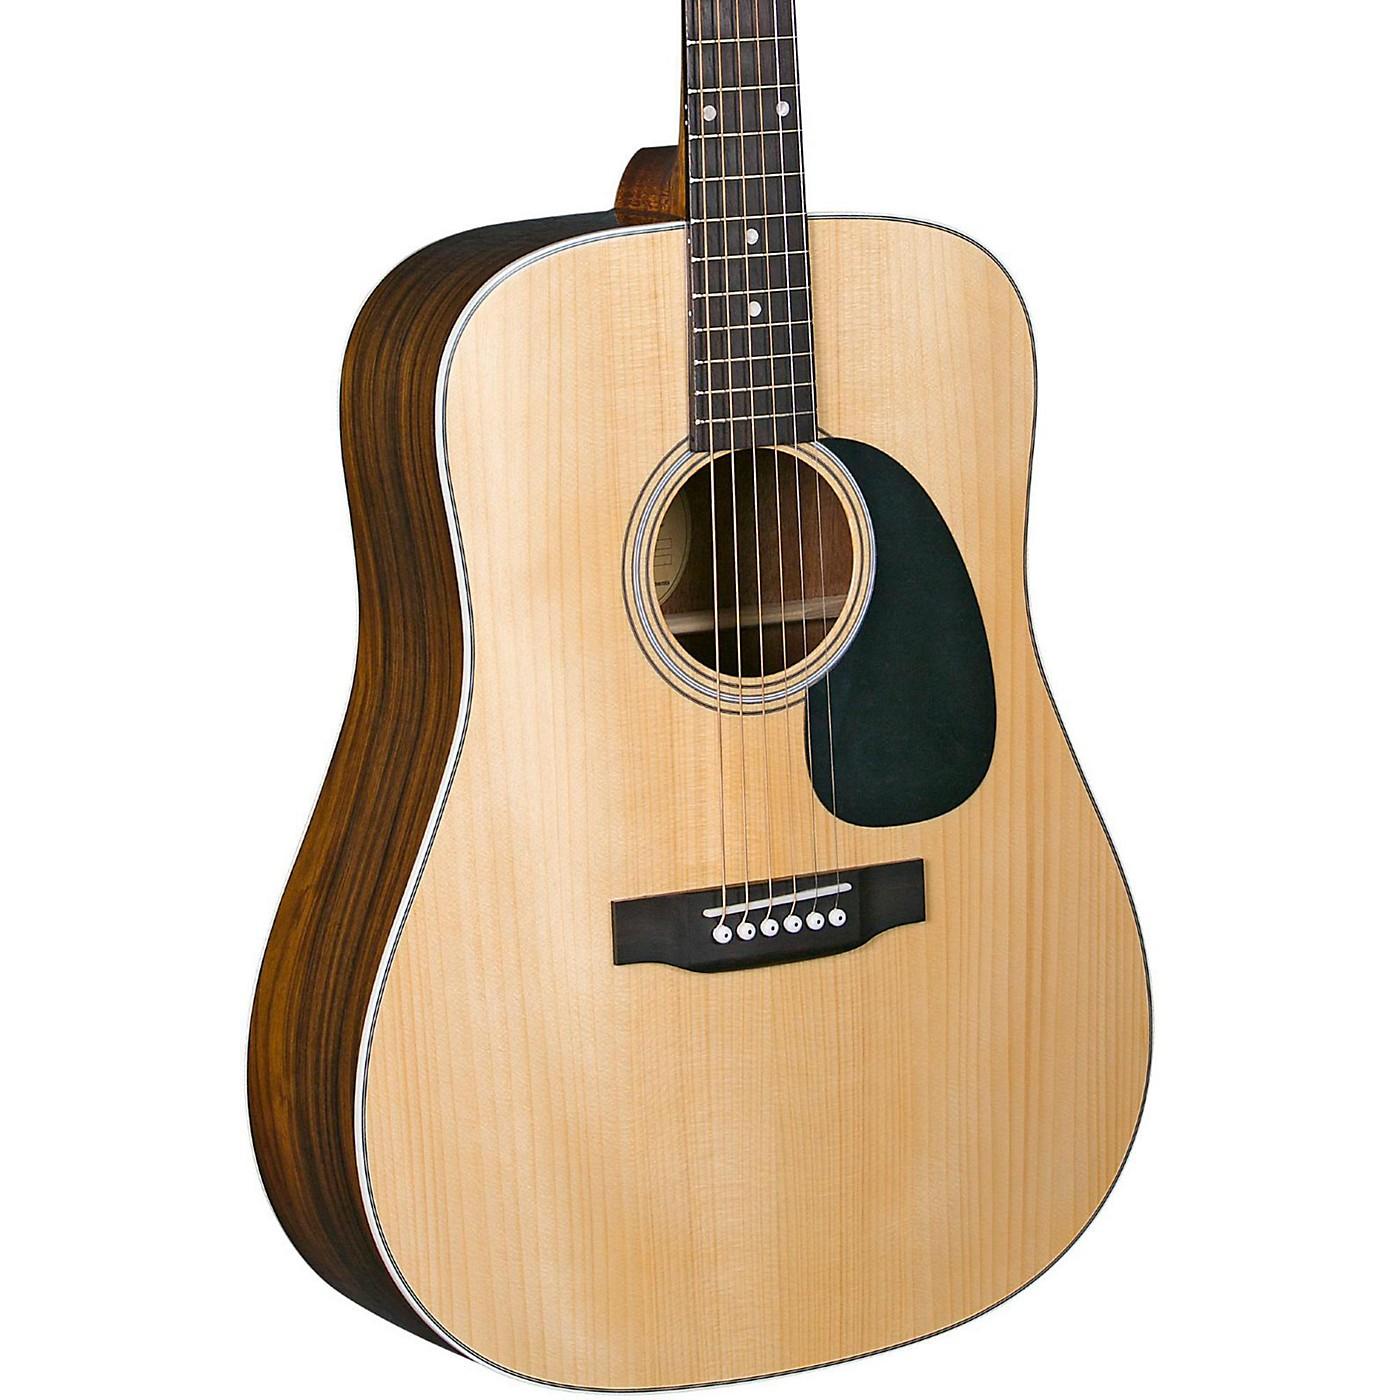 Blueridge Contemporary Series BR-60A Dreadnought Acoustic Guitar thumbnail